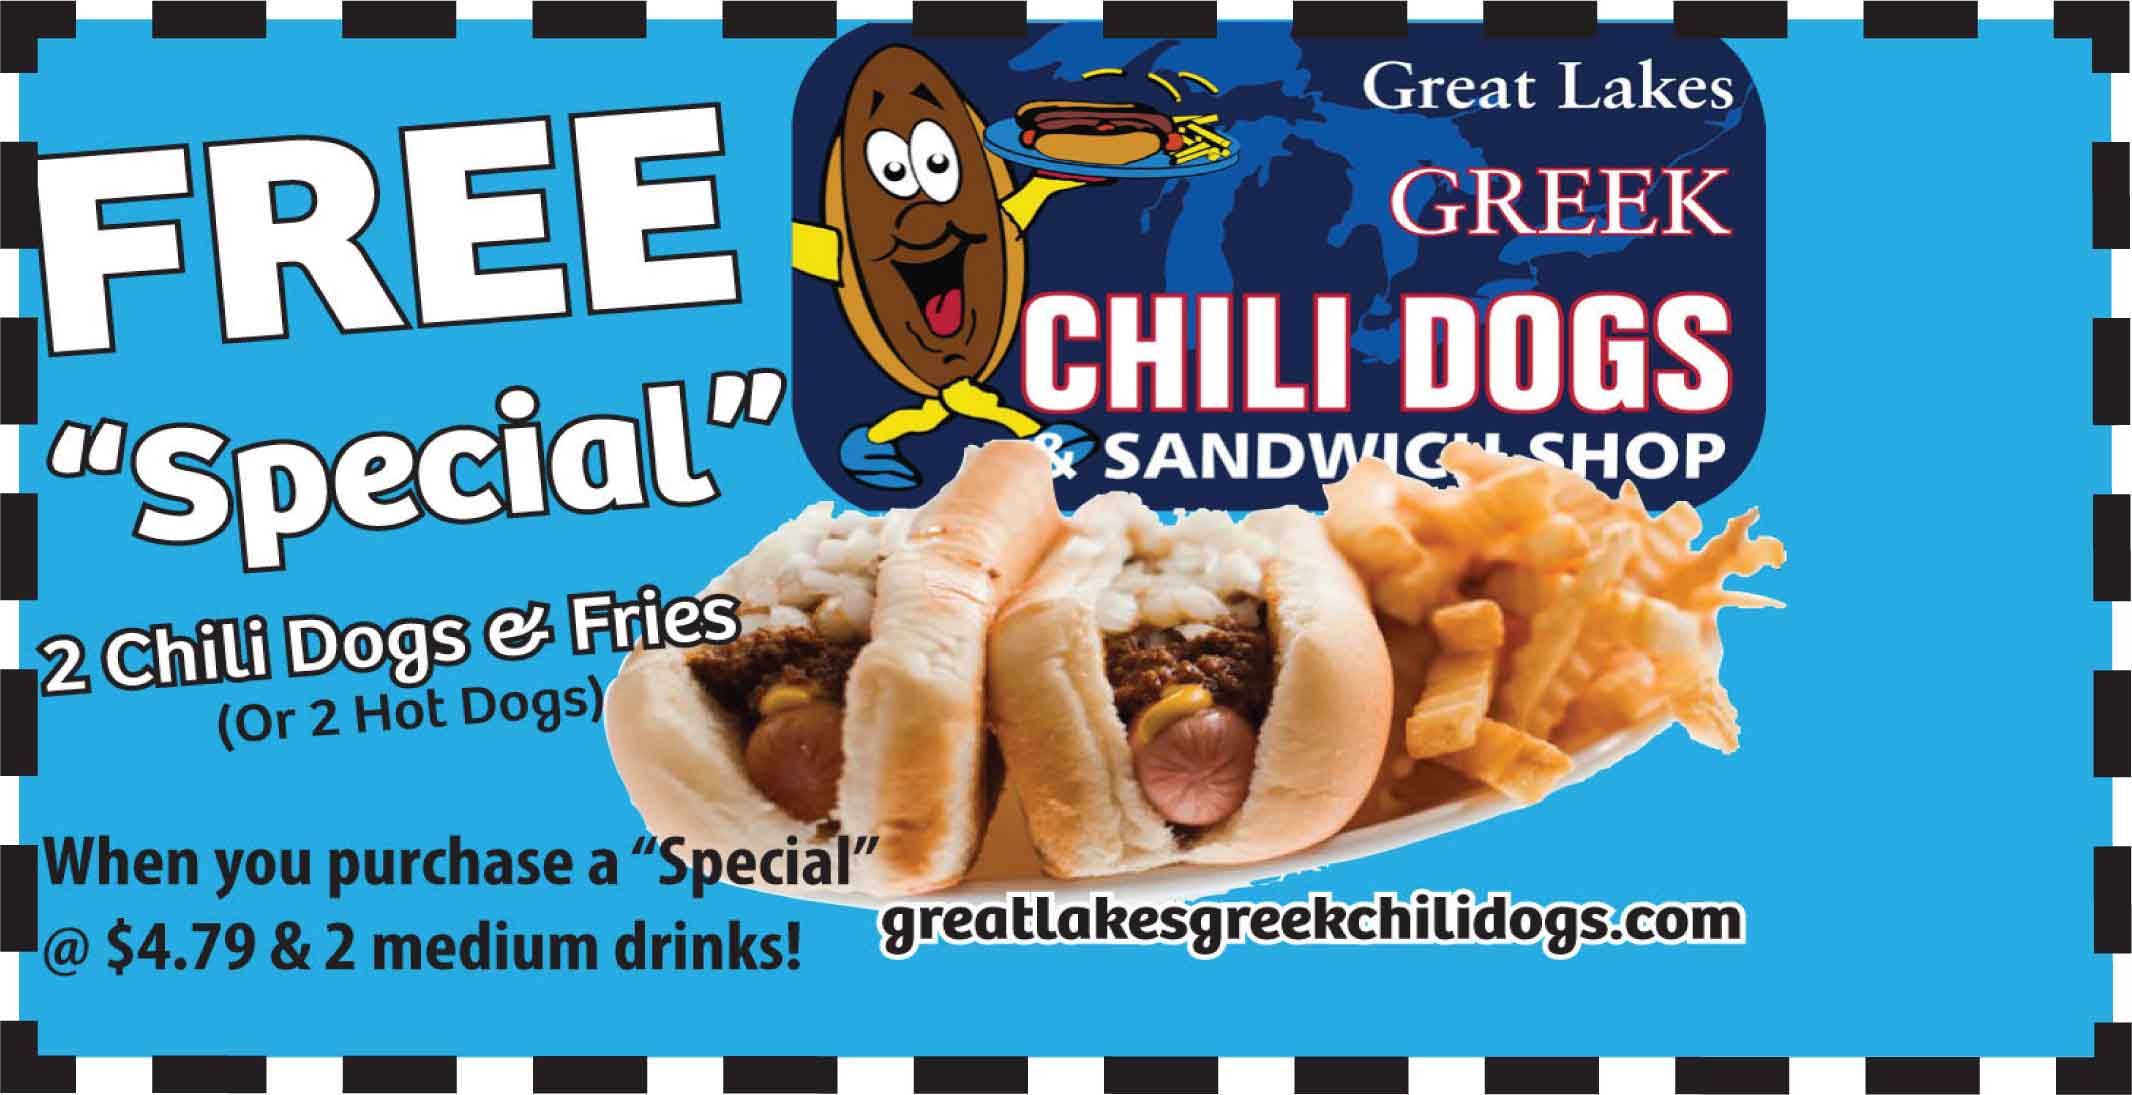 GL Chili Dogs